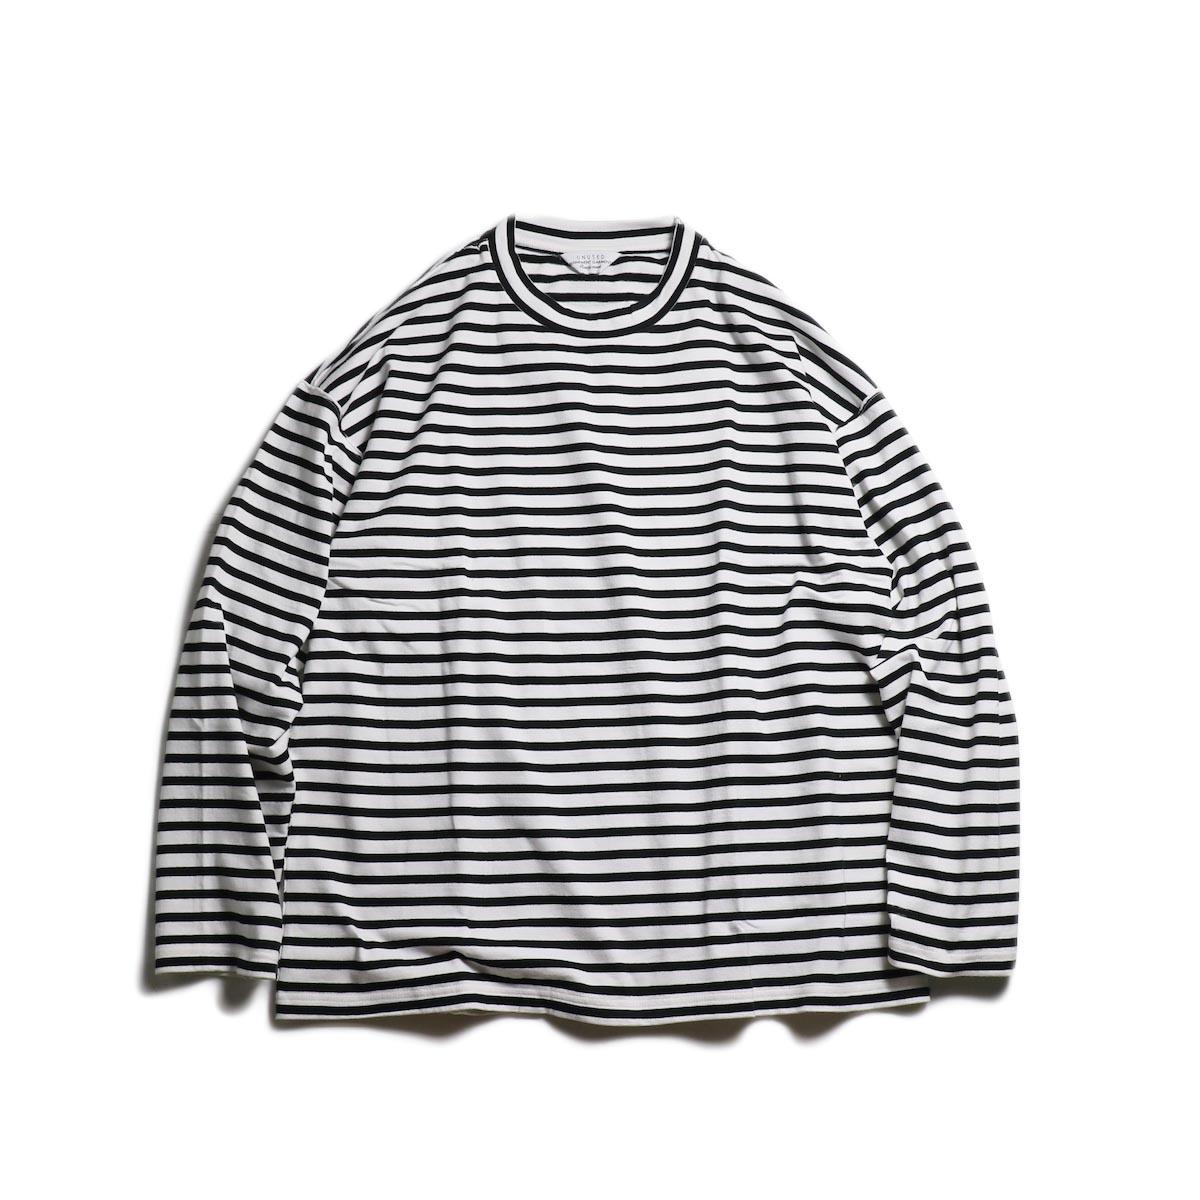 UNUSED / US1682 Long Sleeve Border T-Shirt -White/Black